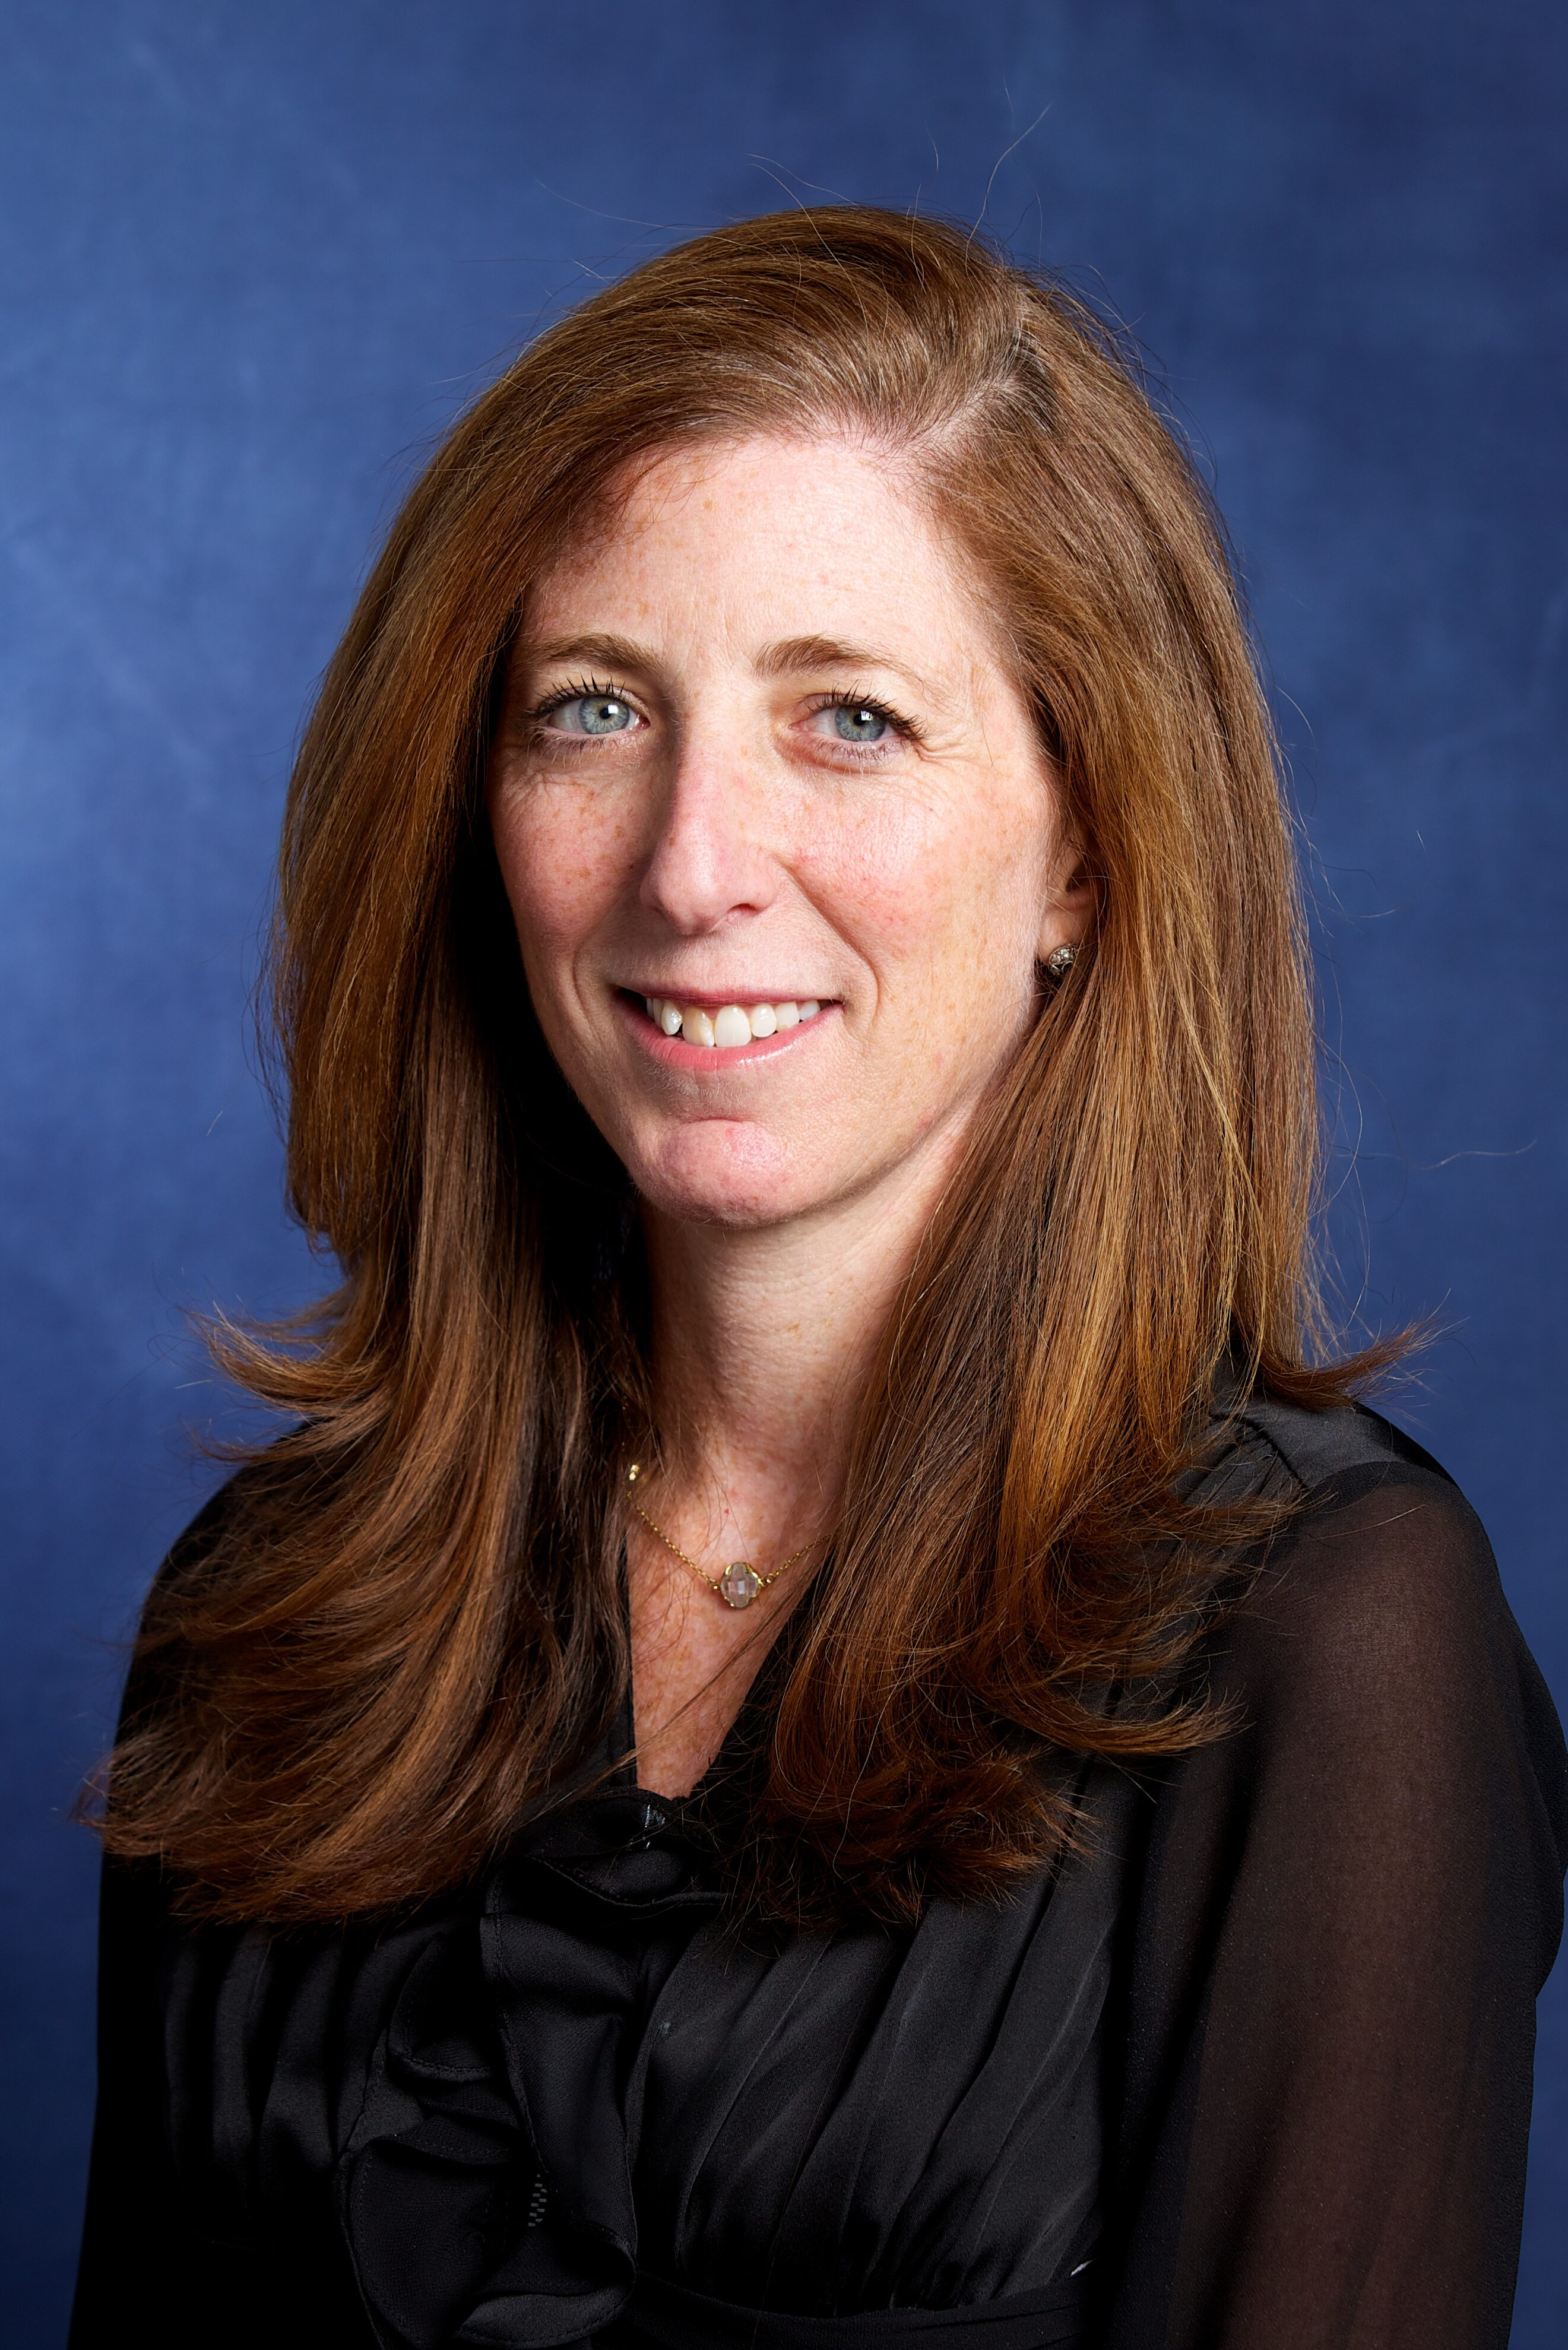 Wendy Mellk (Moderator)